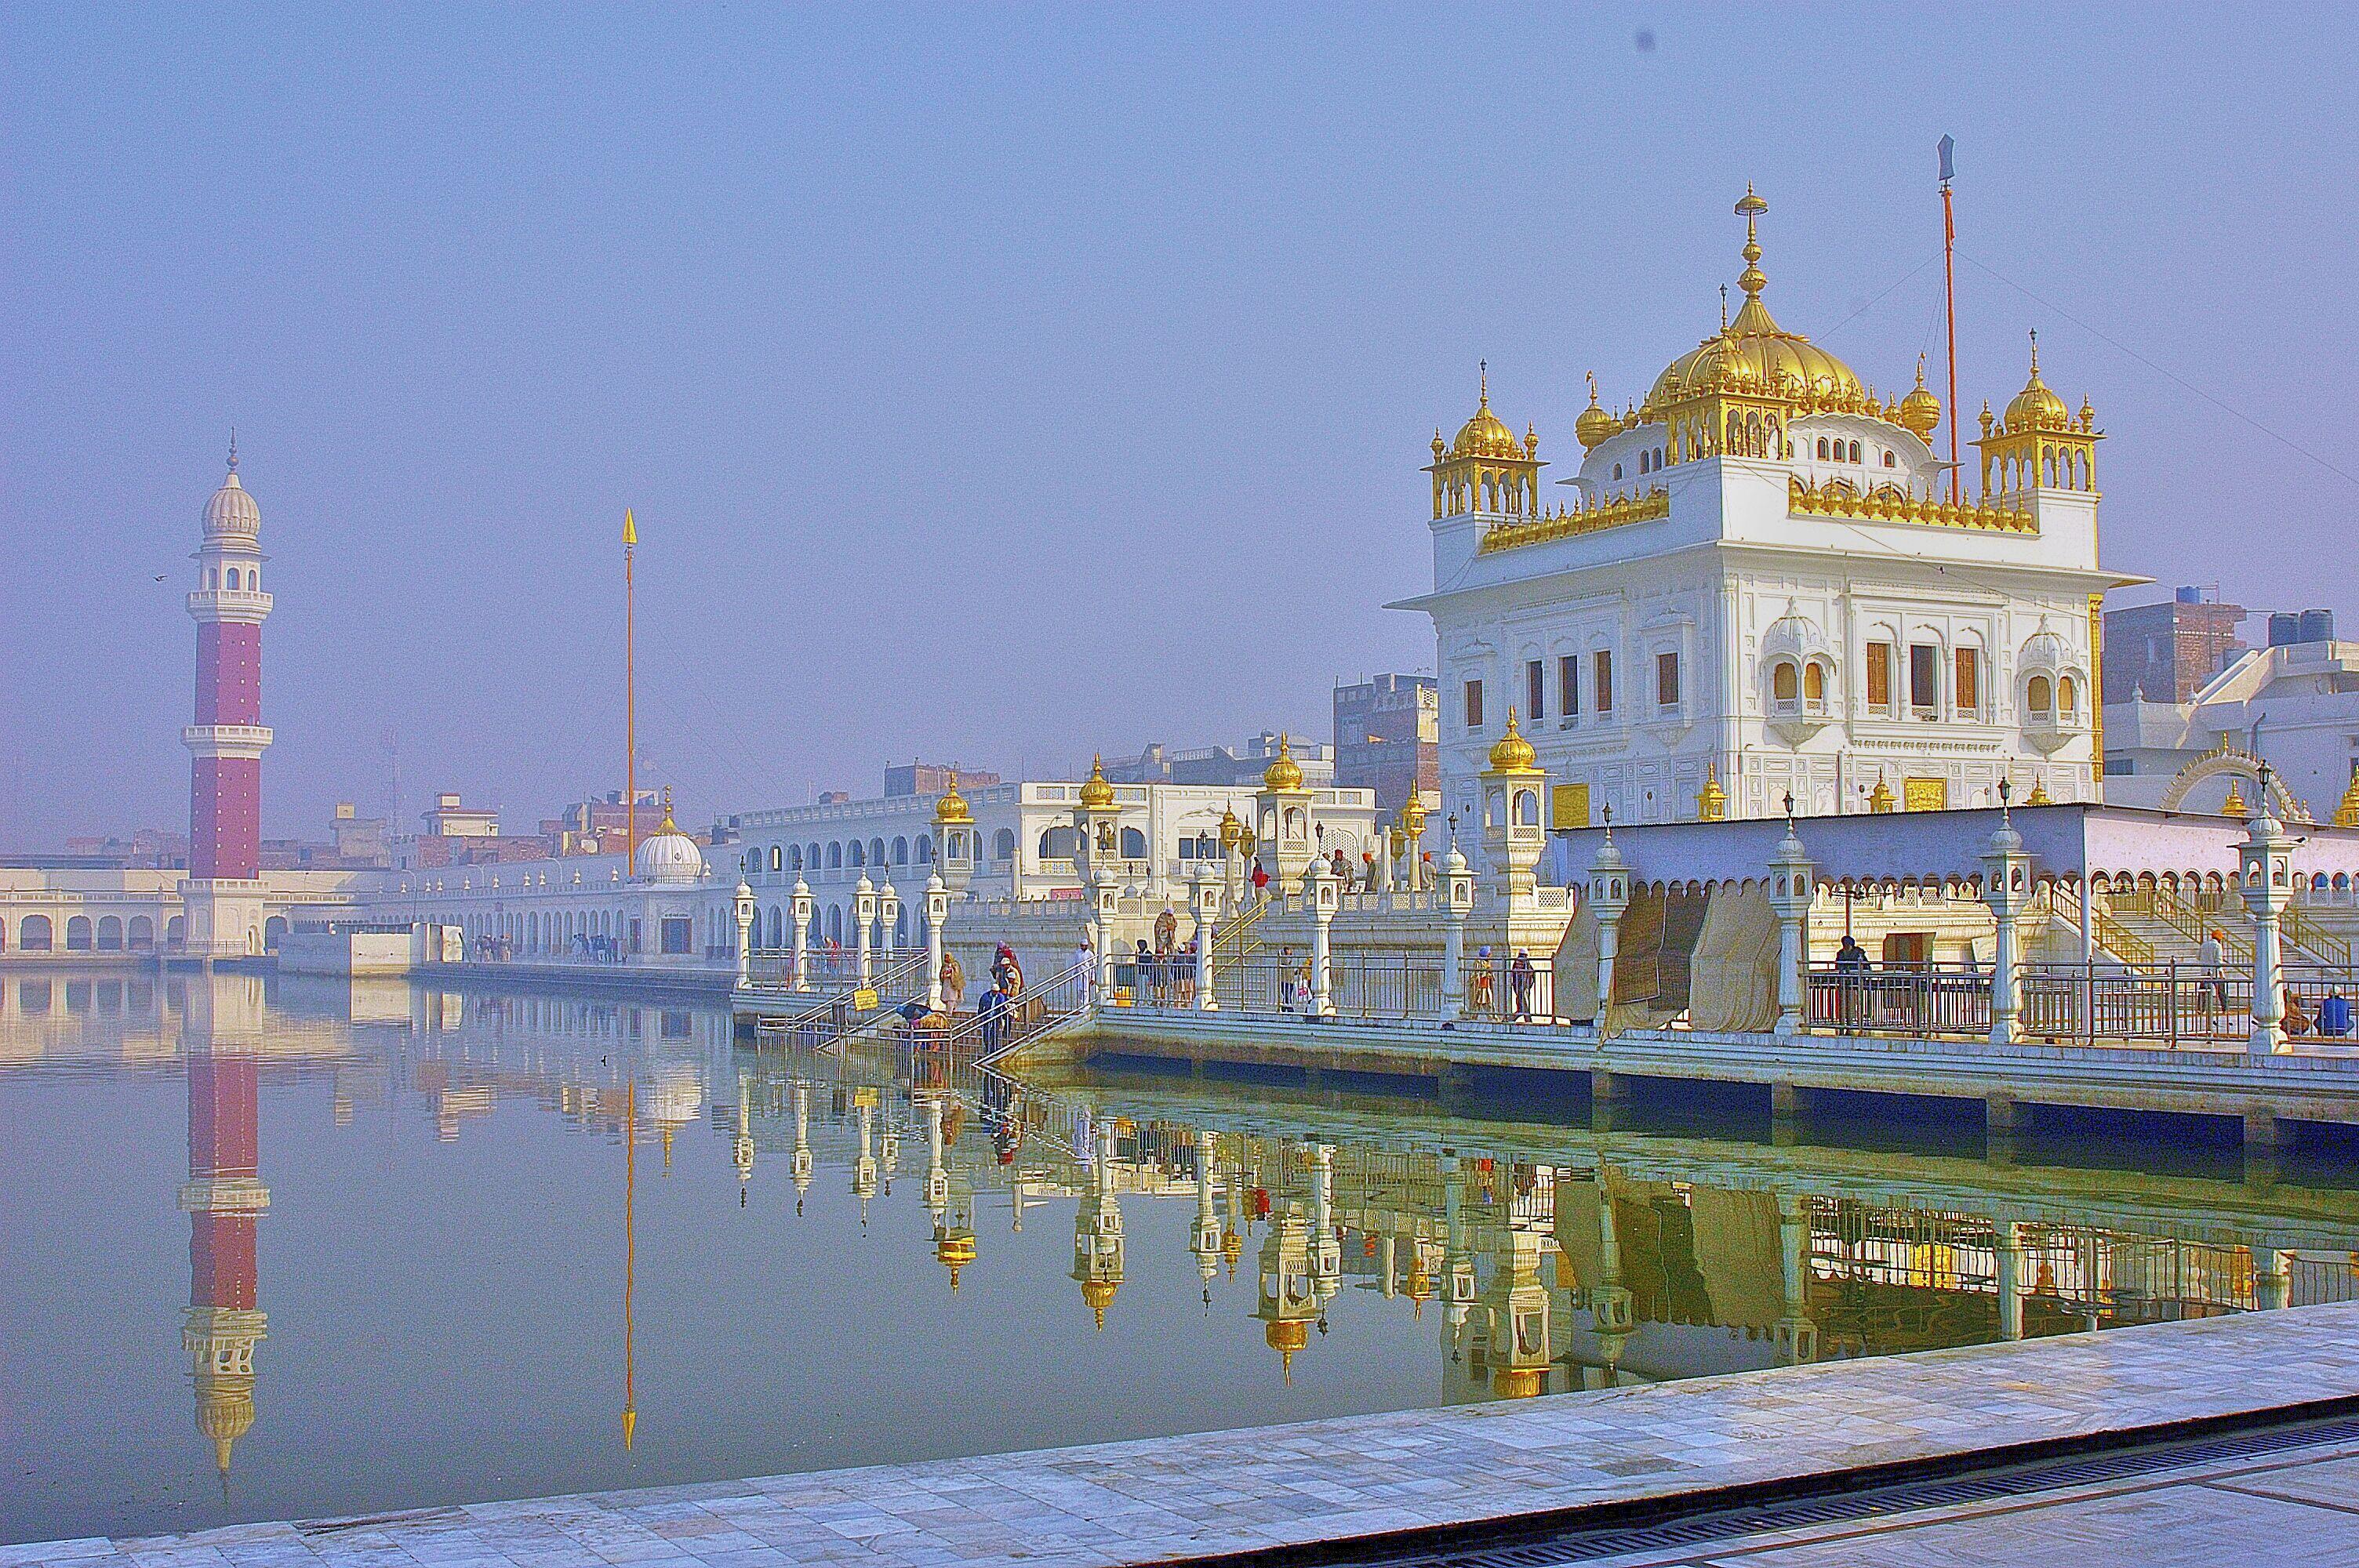 Places To Visit In Amritsar A Memorable Trip To Cherish Travel Travelblogger Punjab Amritsar